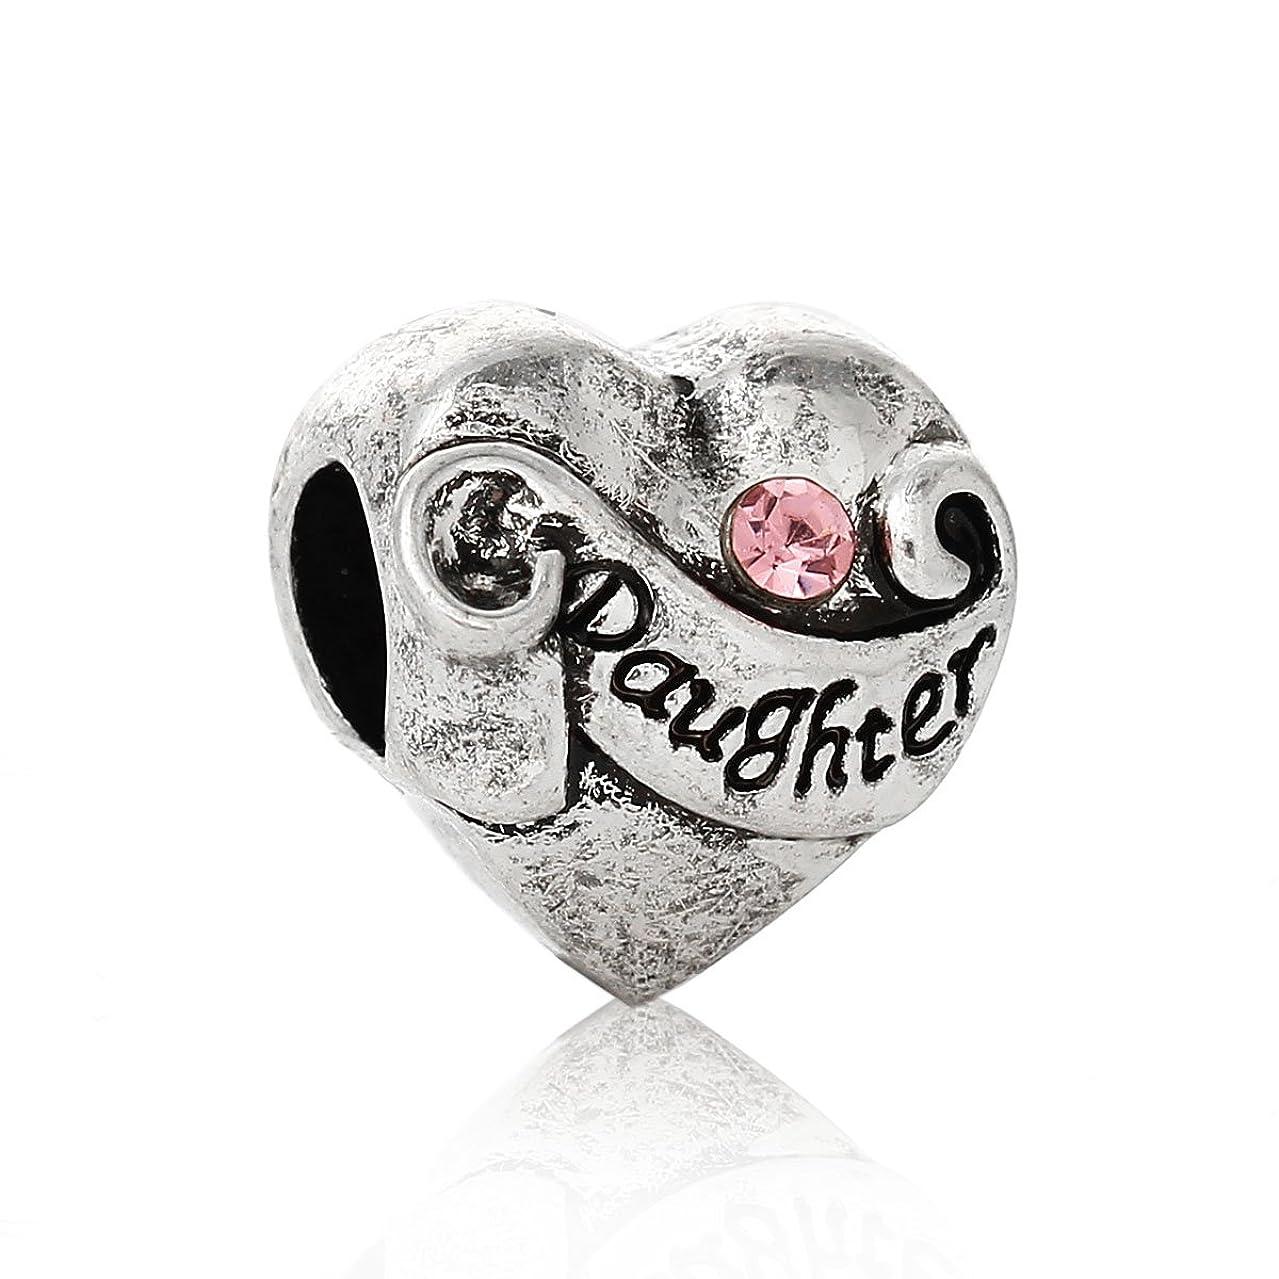 PEPPERLONELY Brand 10PC Antique Silver European Charm Beads Heart Pink Rhinestone